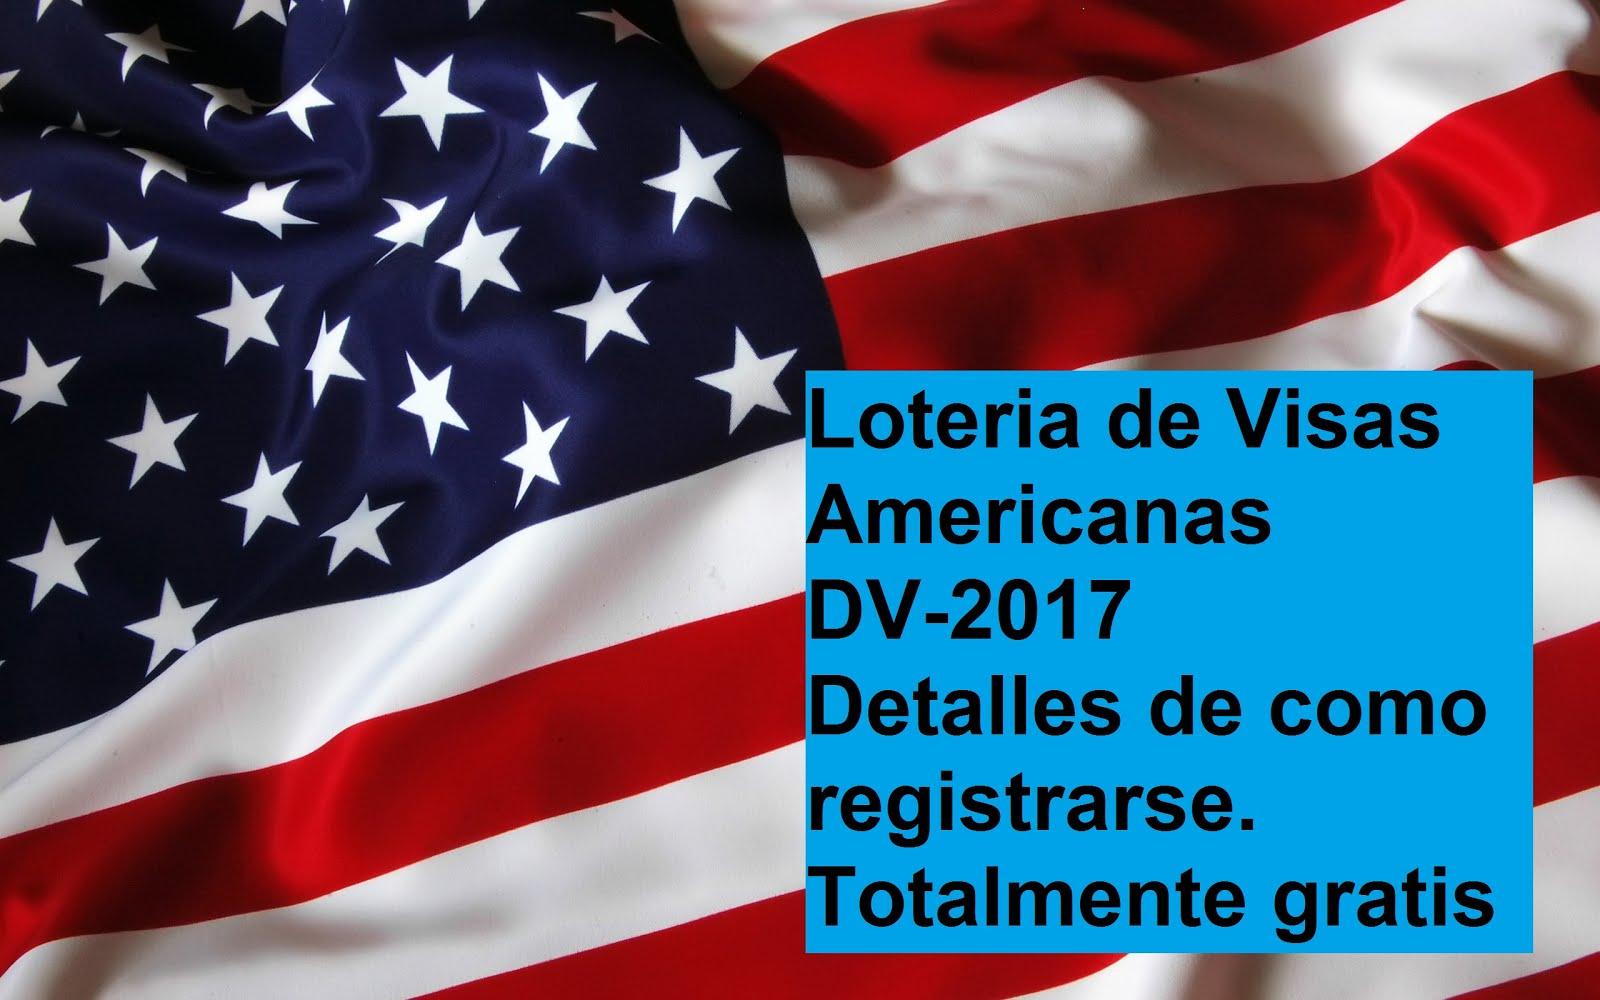 Loteria de Visas DV-2017